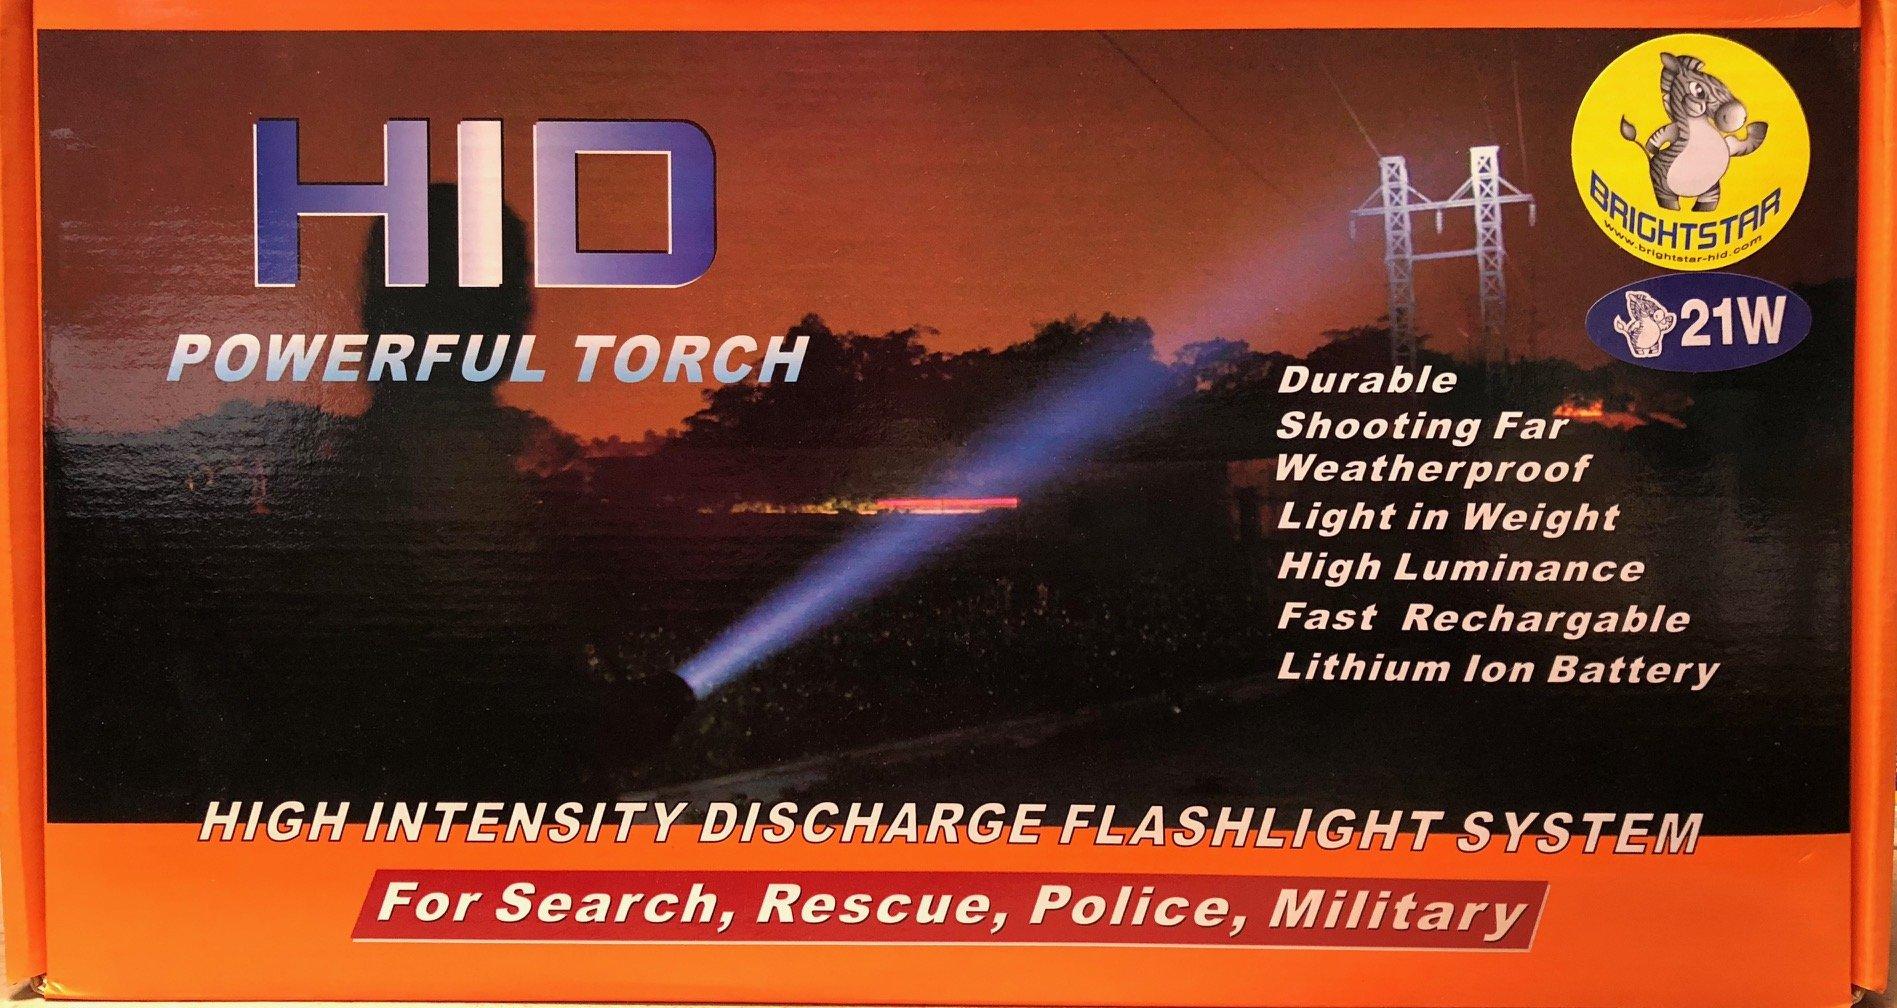 Brightstar 21W Professional HID Flashlight